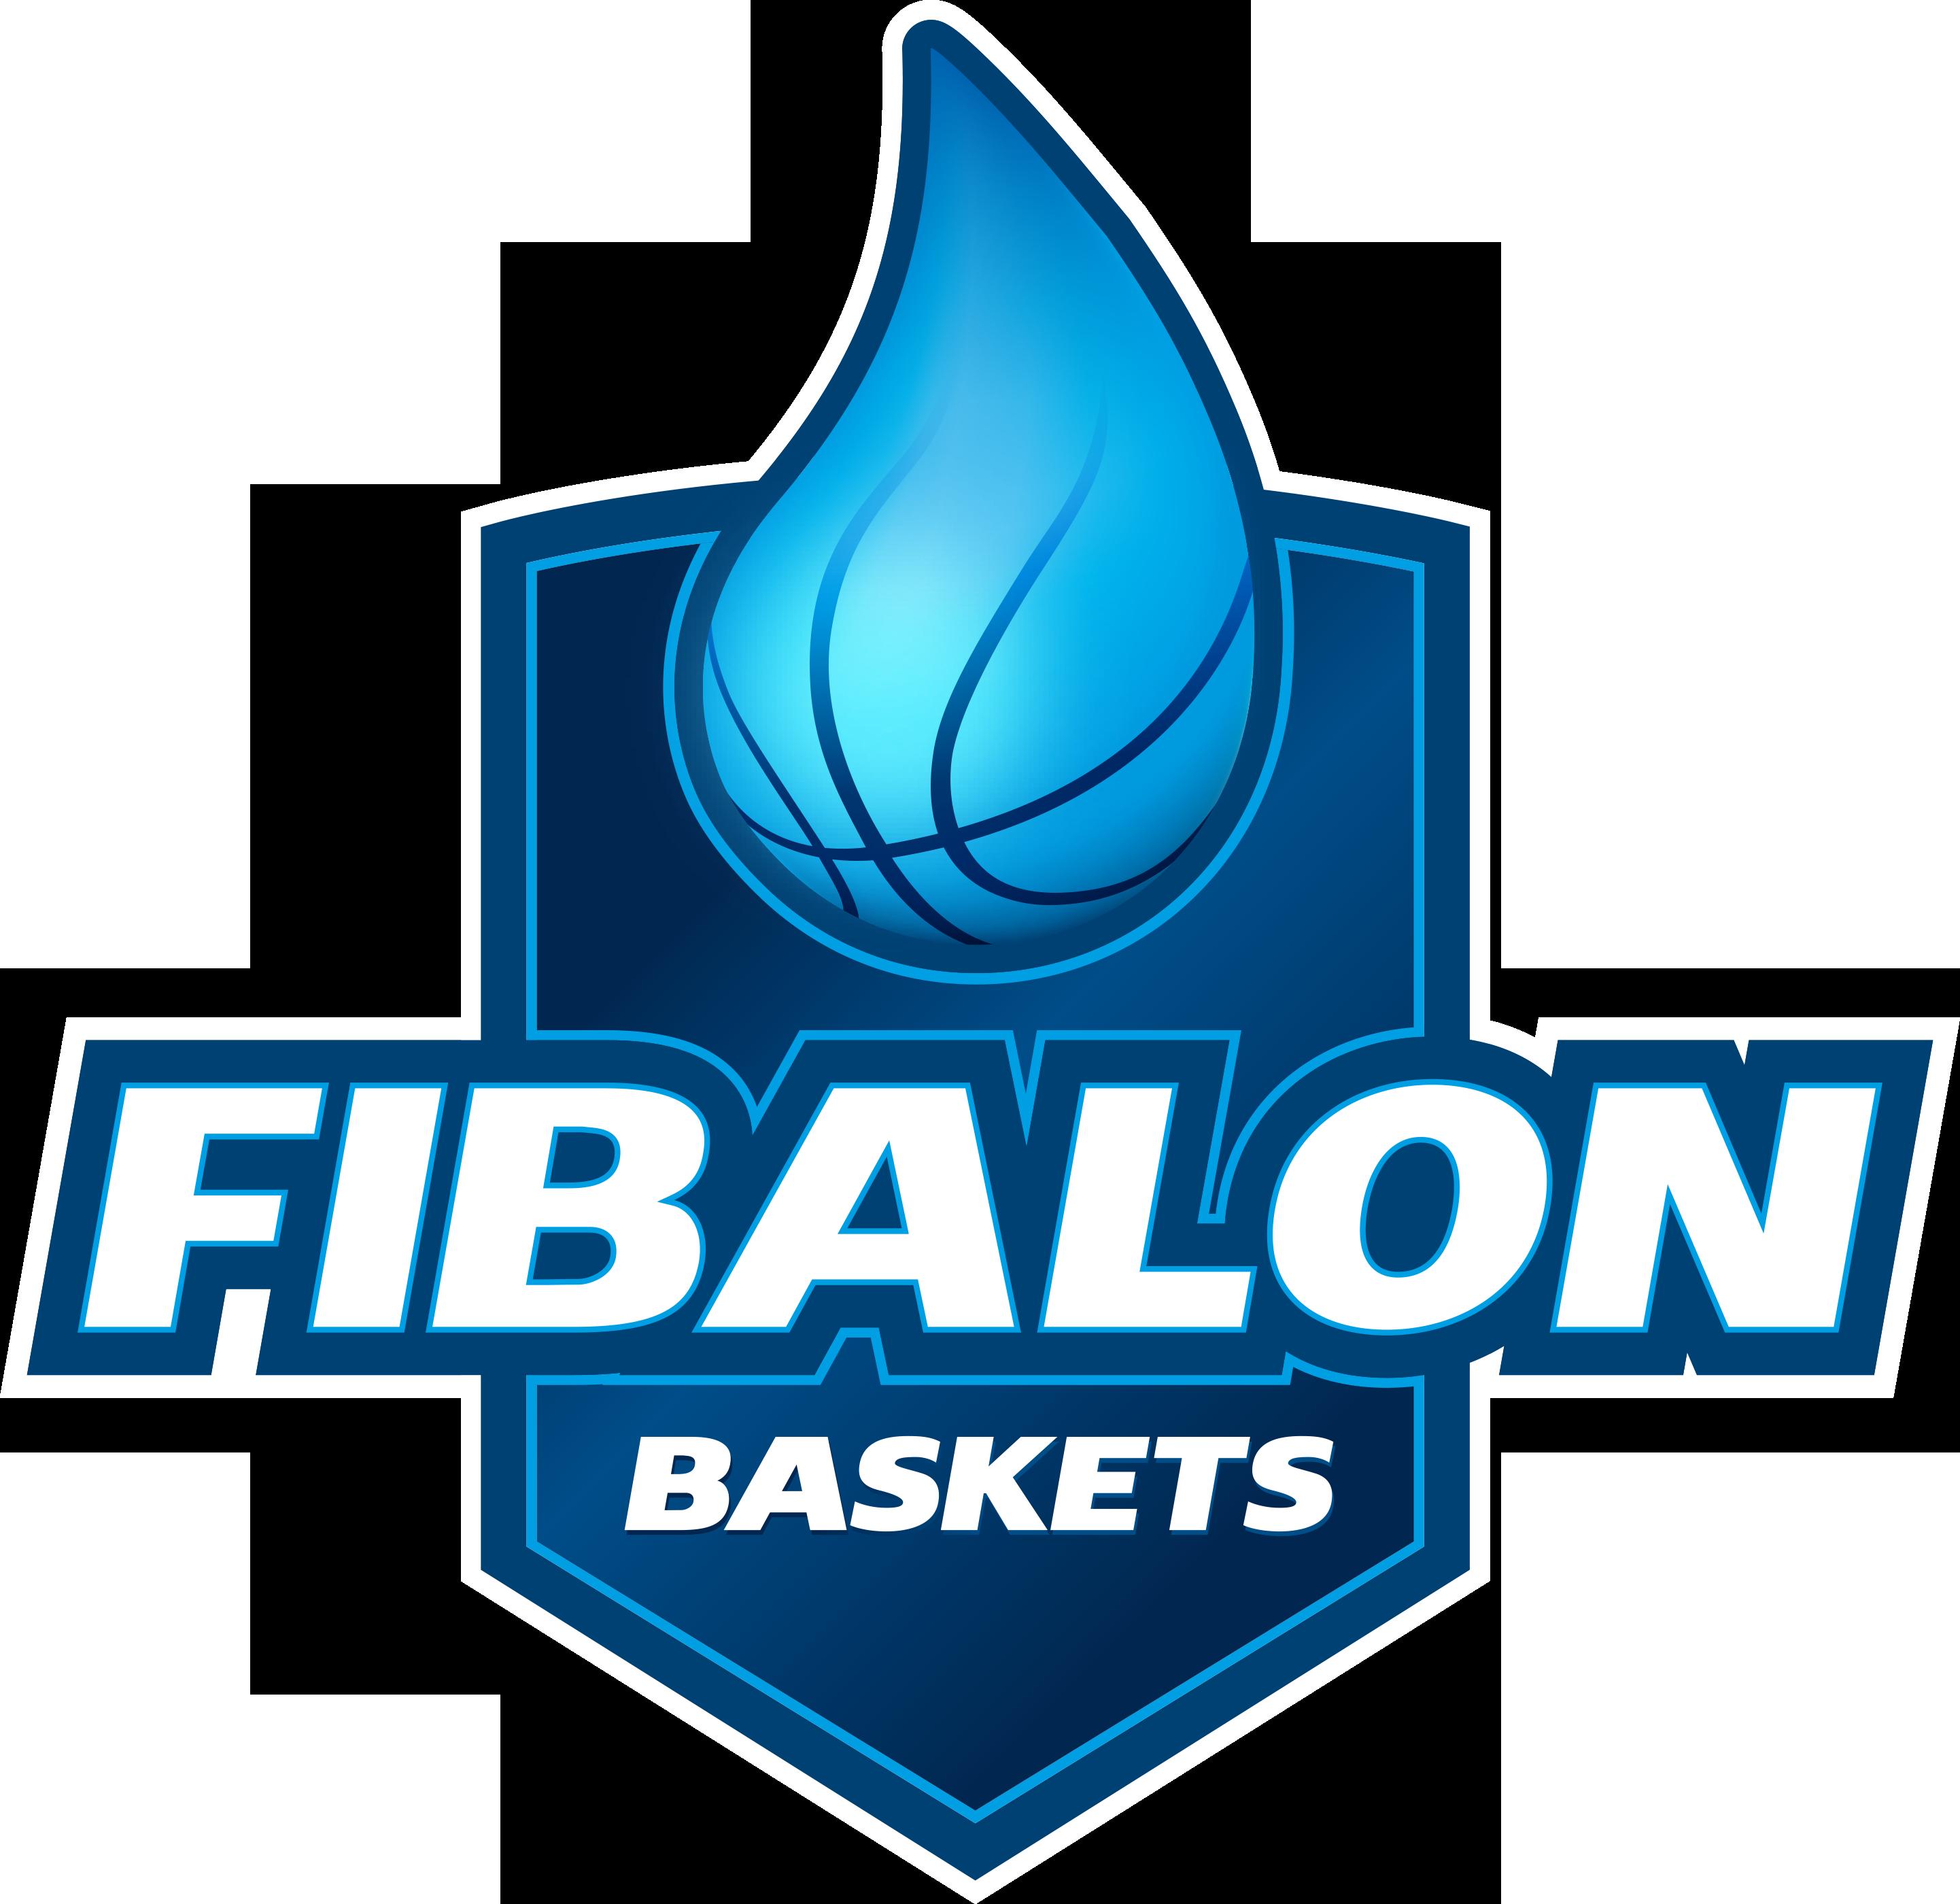 Fibalon Baskets Fan Shop